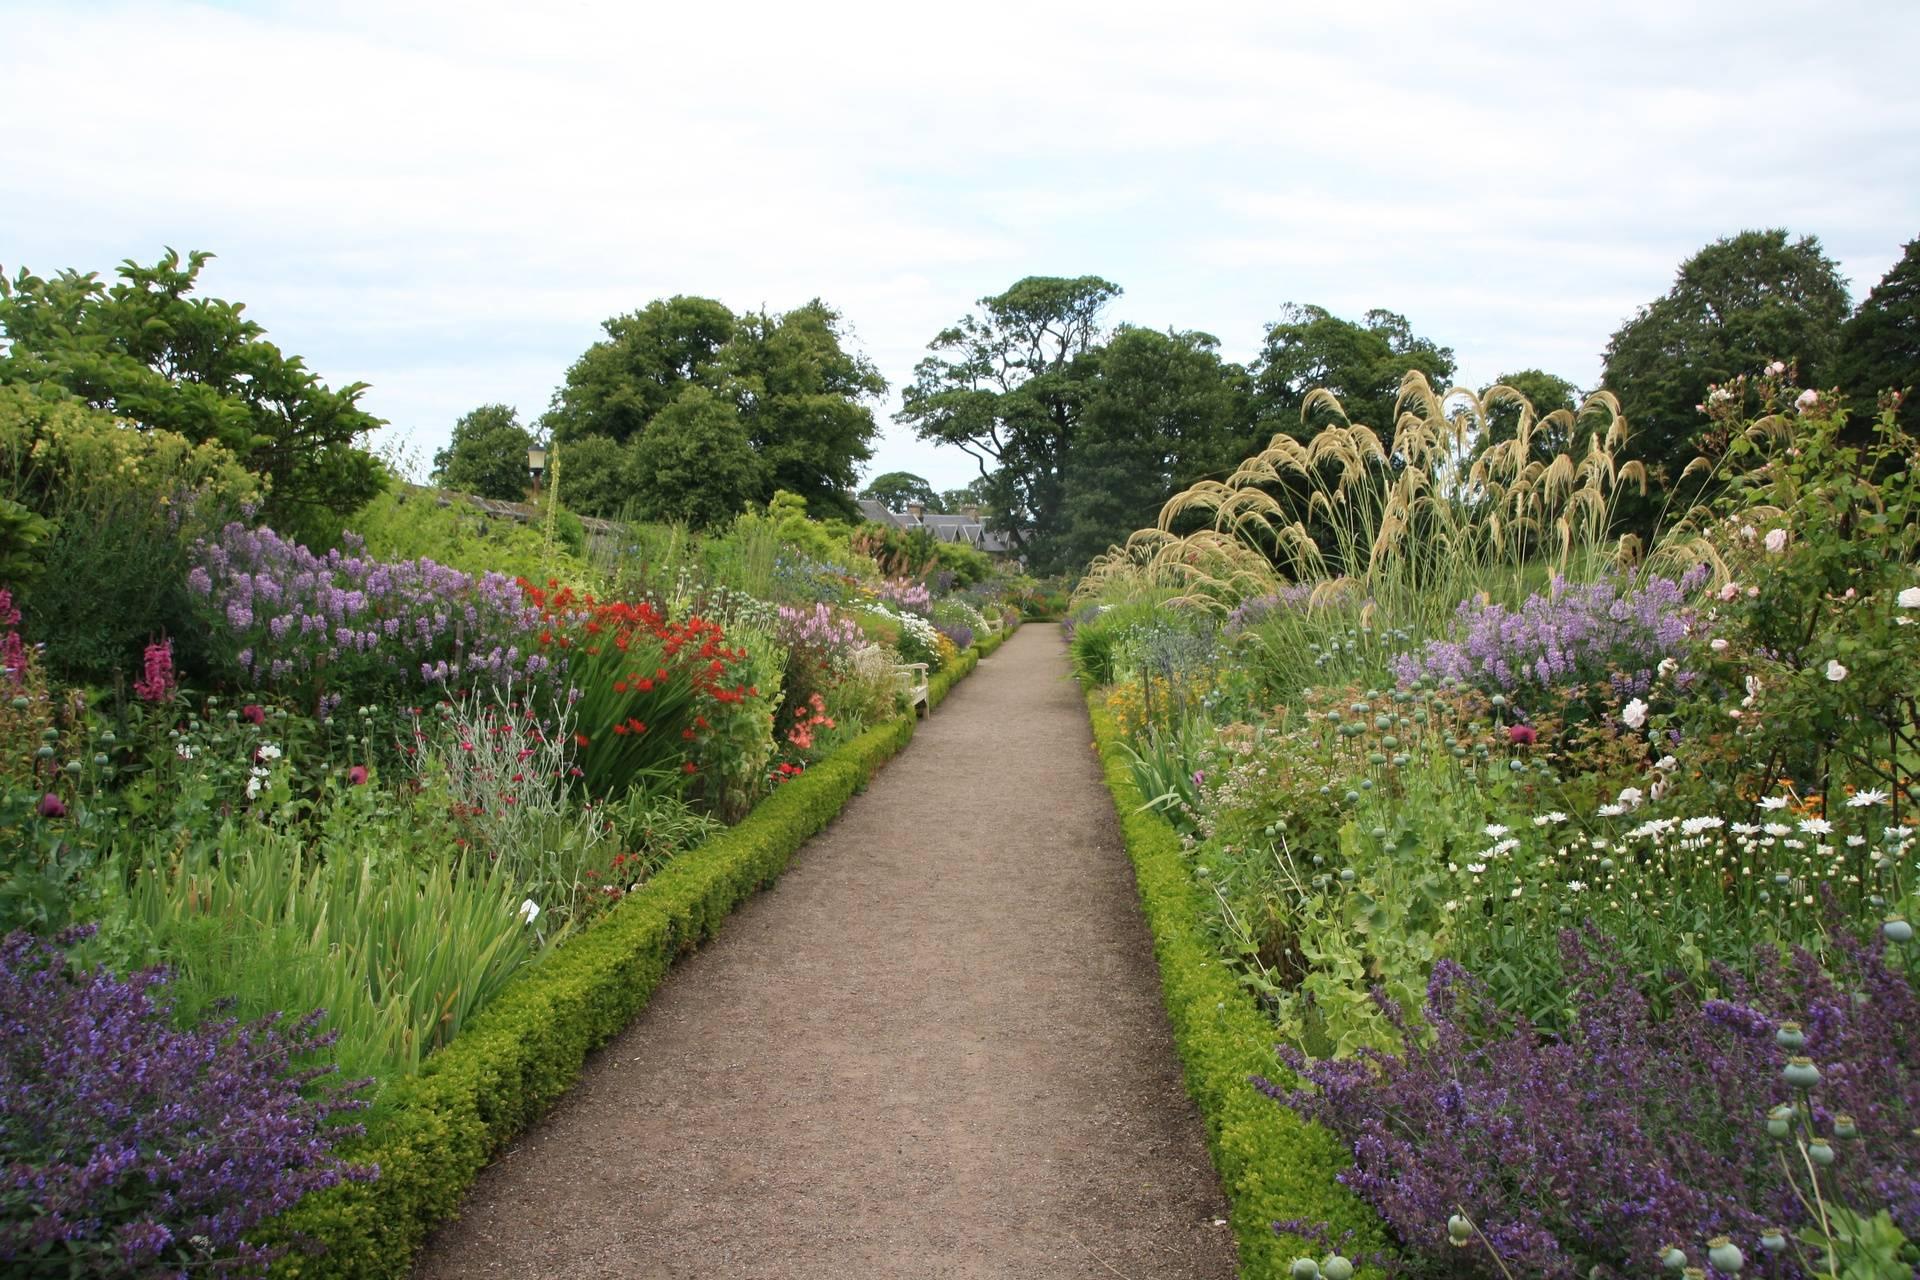 Floral borders at Dirleton Castle